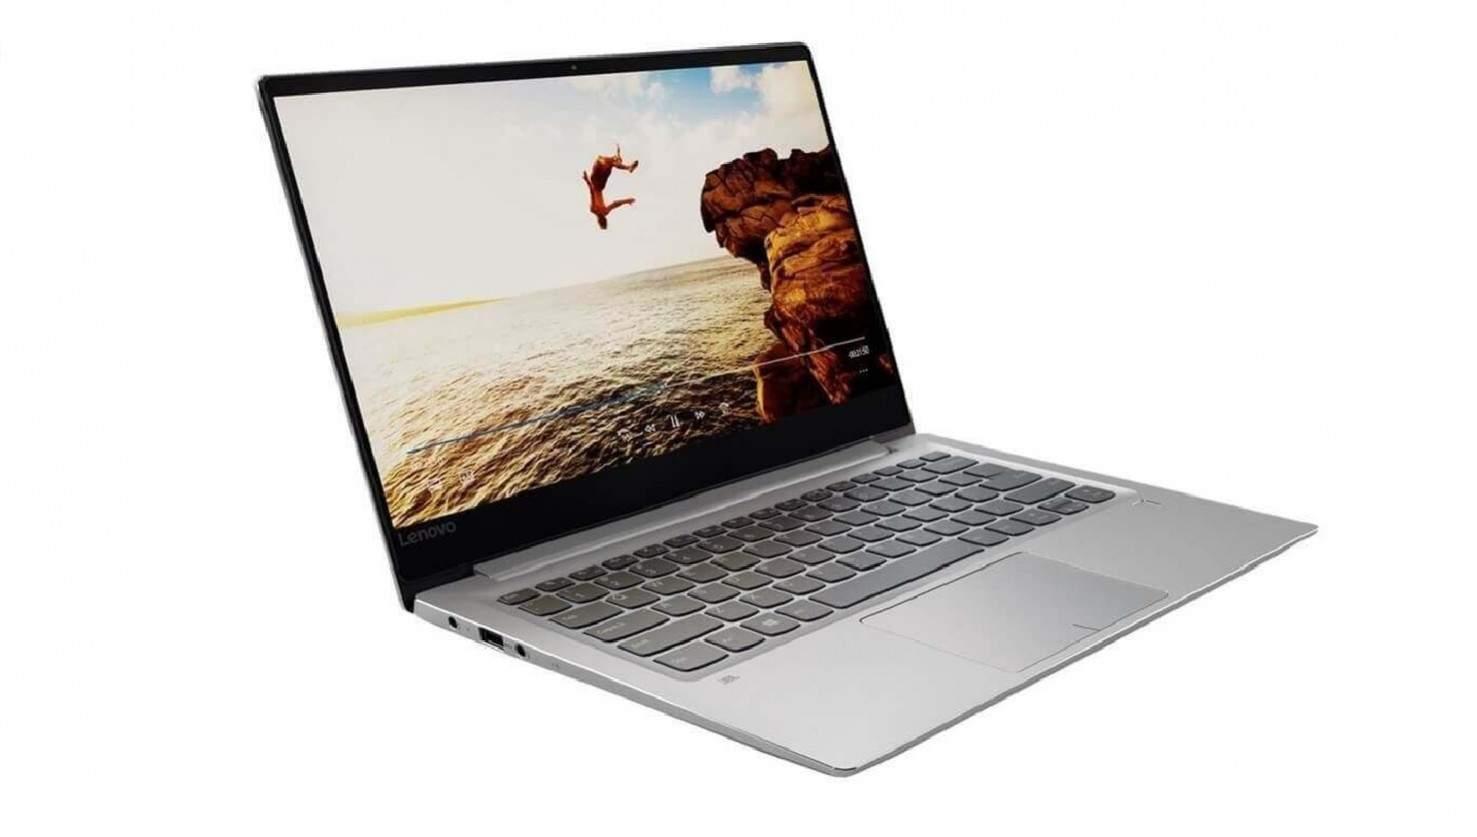 Laptop Lenovo Ideapad 720s Usung Bezel Tipis Dan Grafis